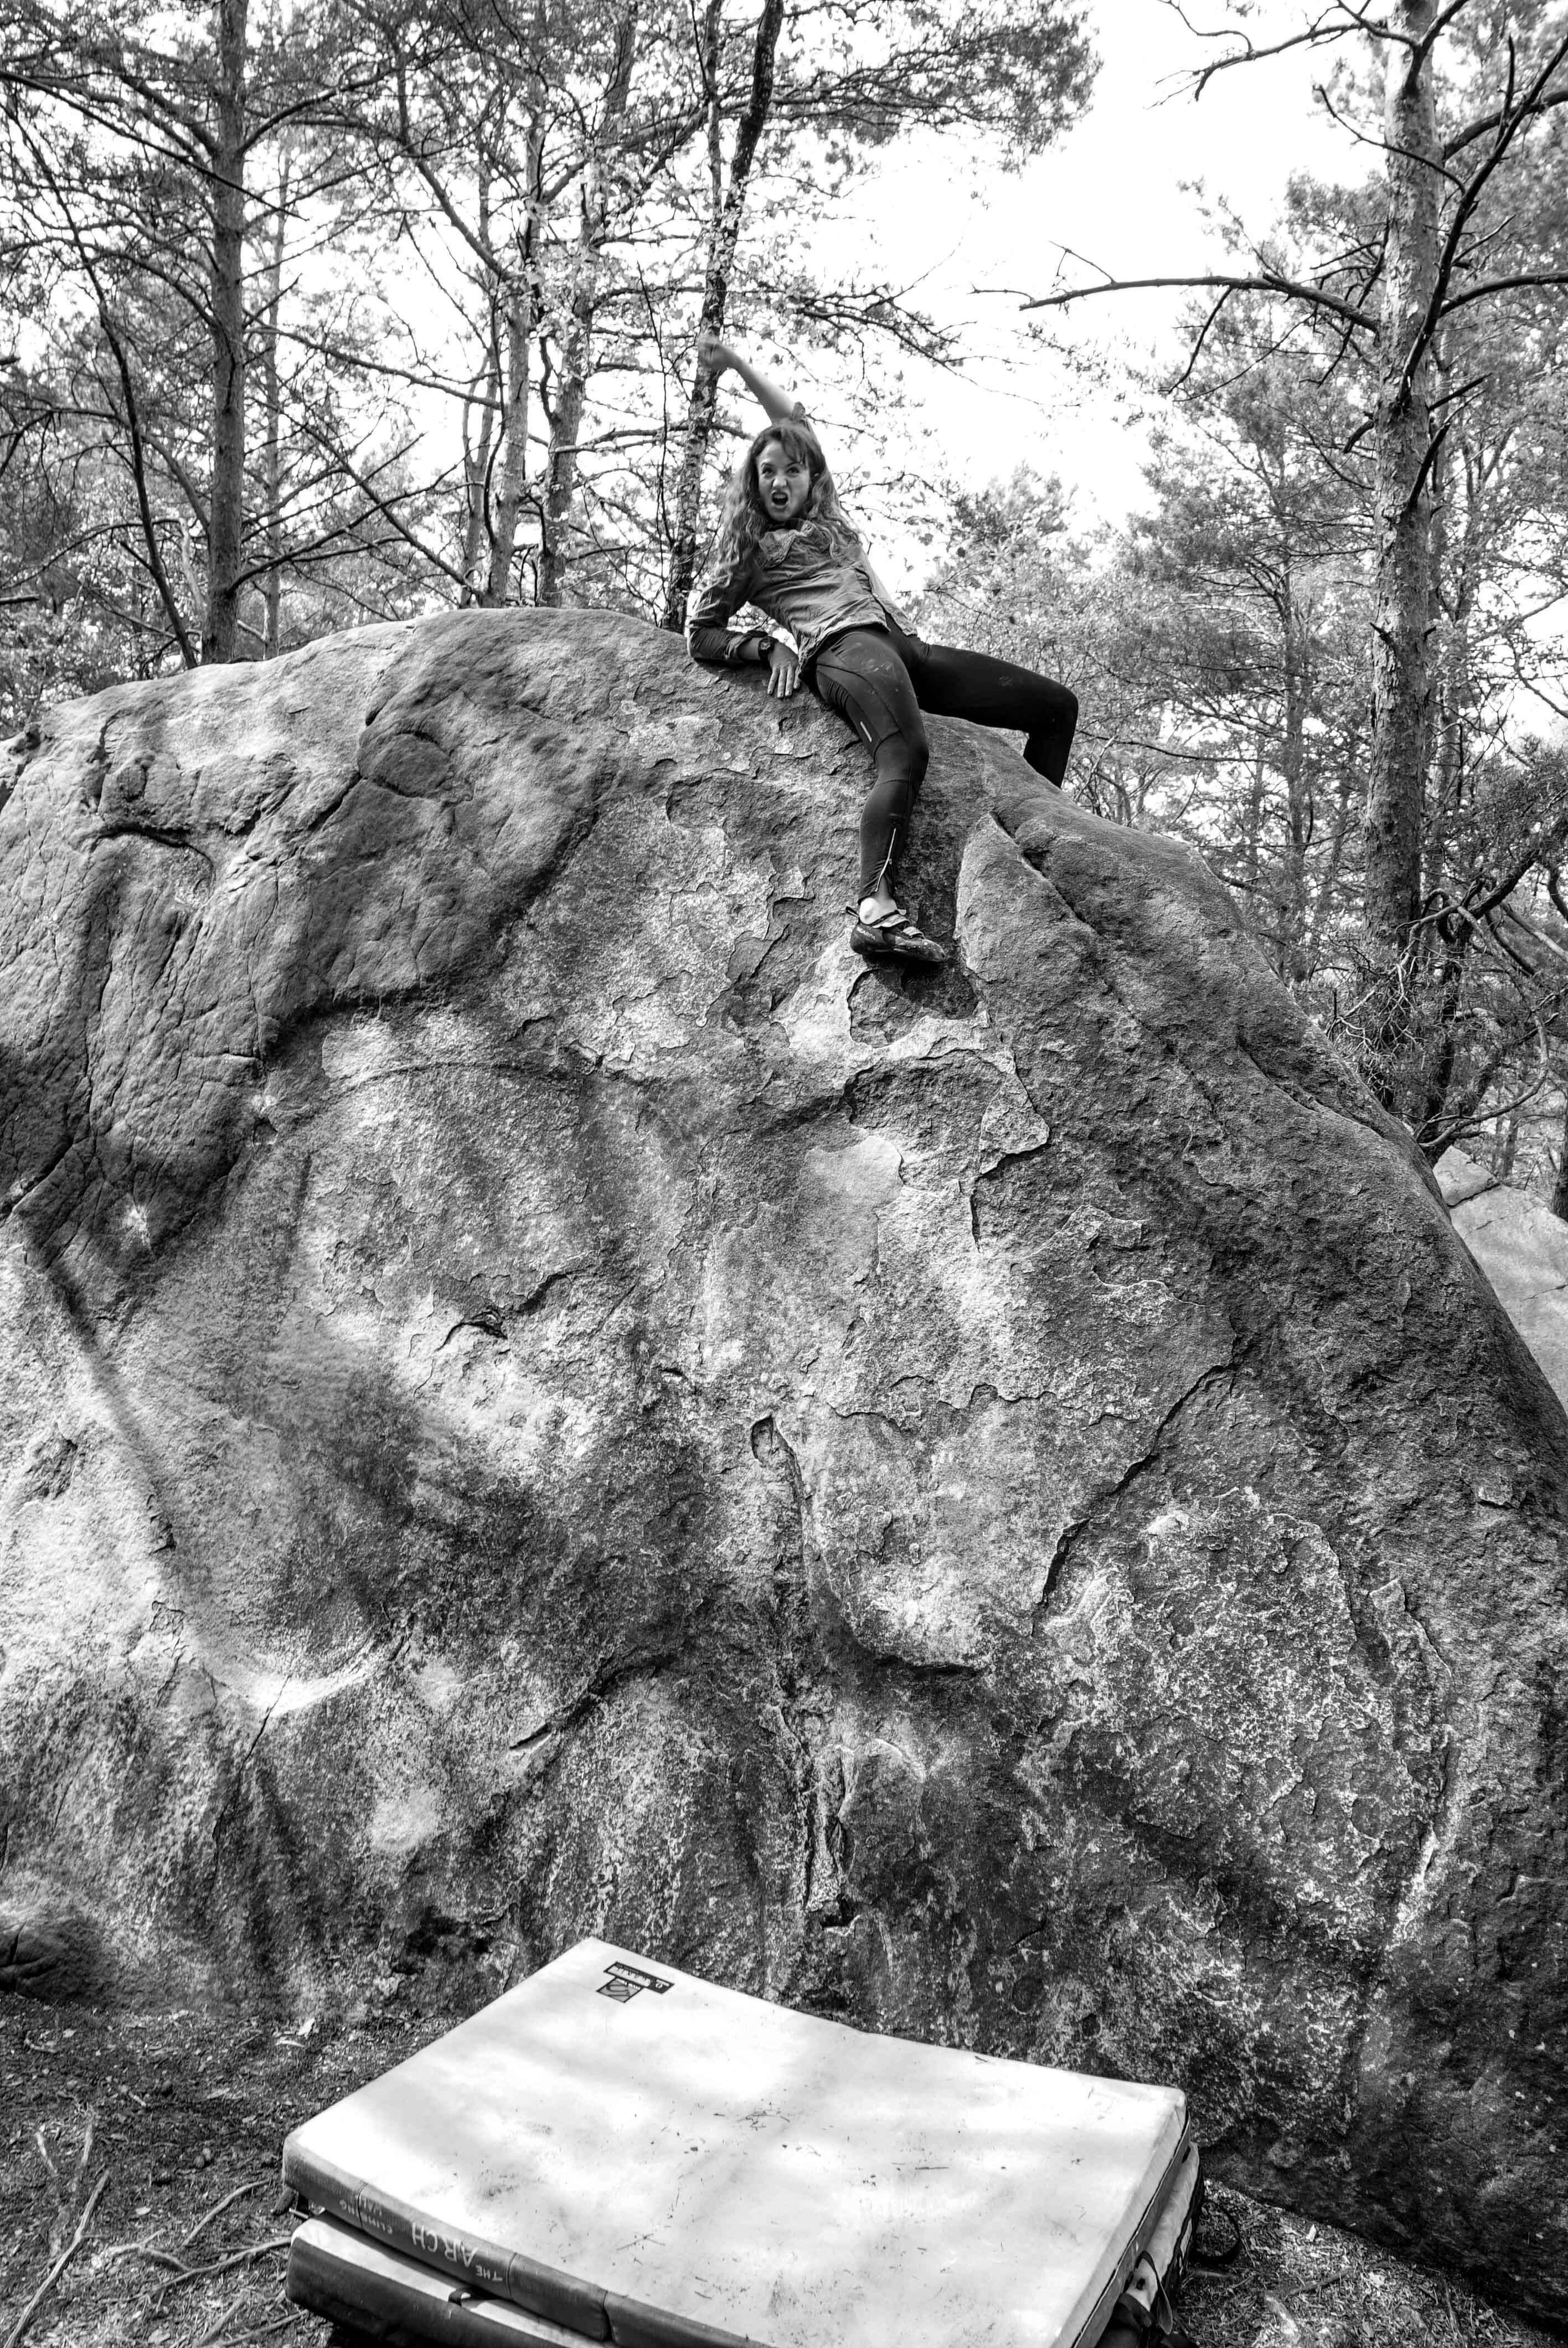 fontainbleau climbing 2016 mike brindley-60